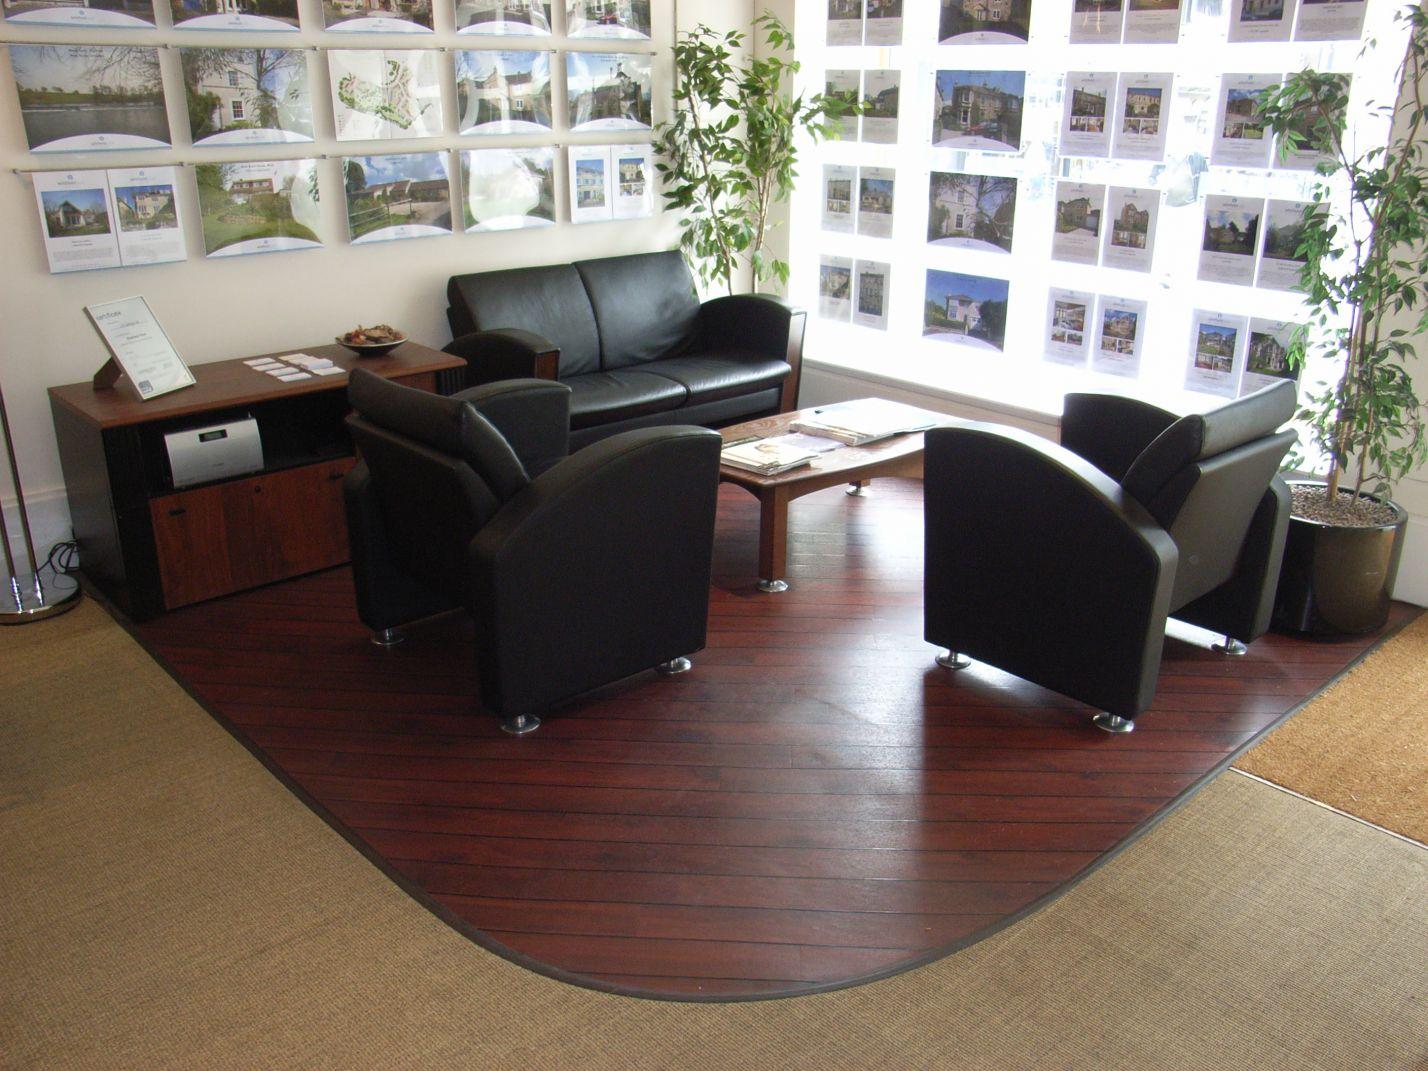 estate agent office break out area